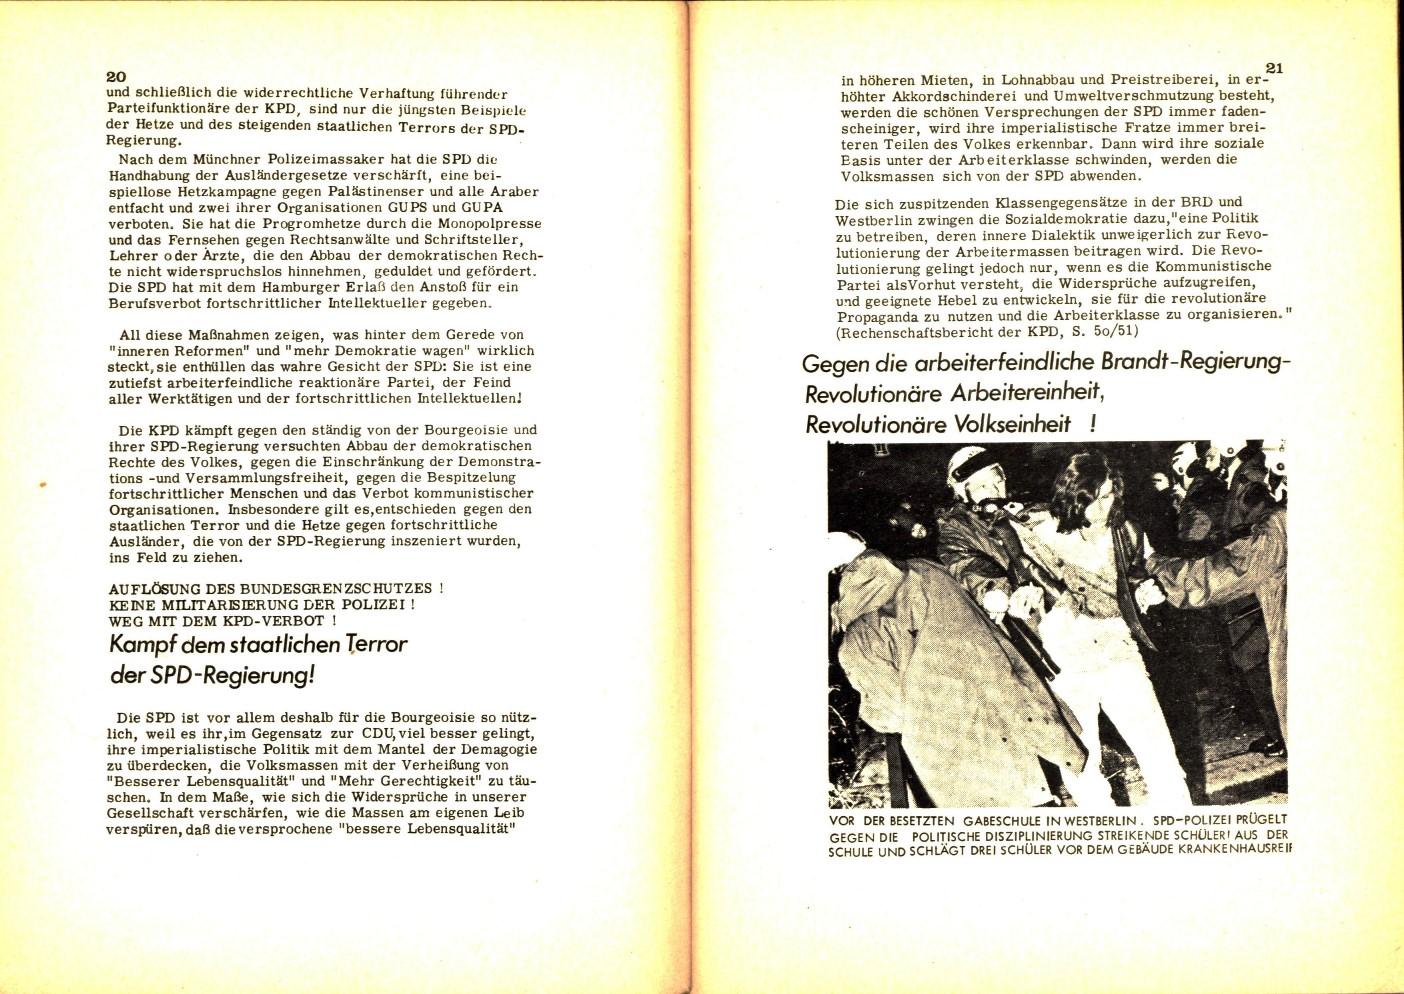 KOV_1973_Aktionsprogramm_13